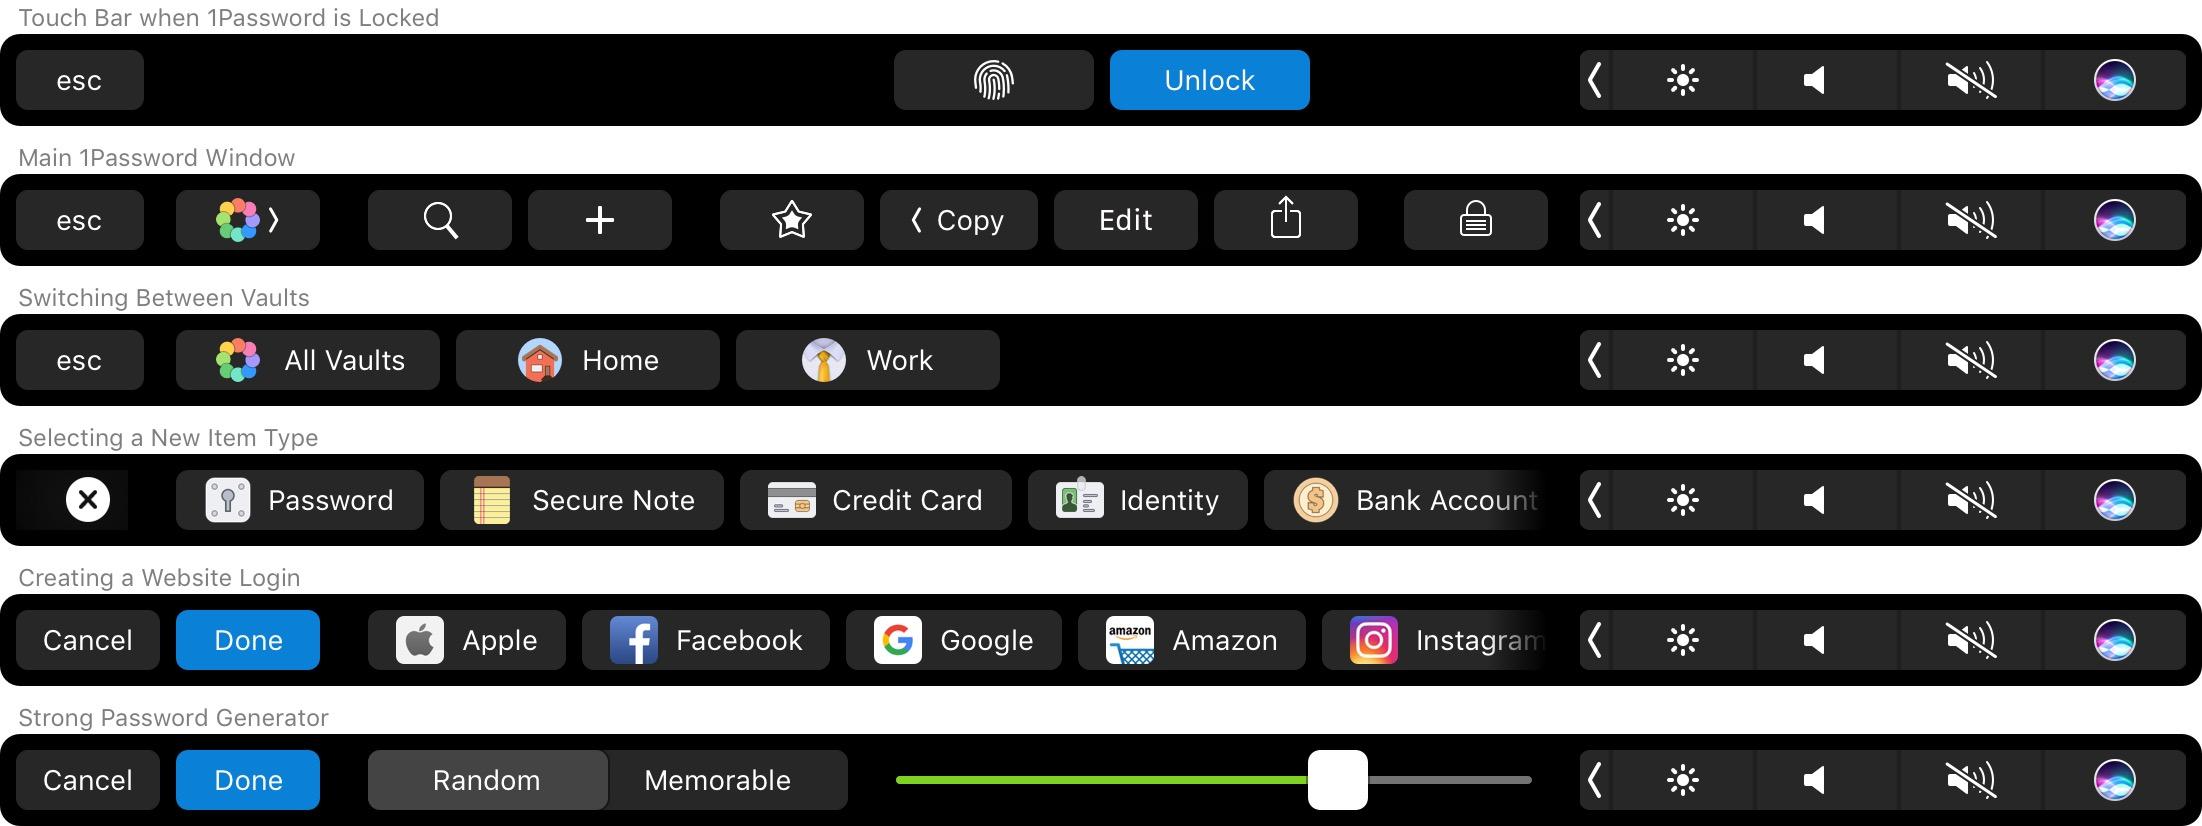 app per touch bar